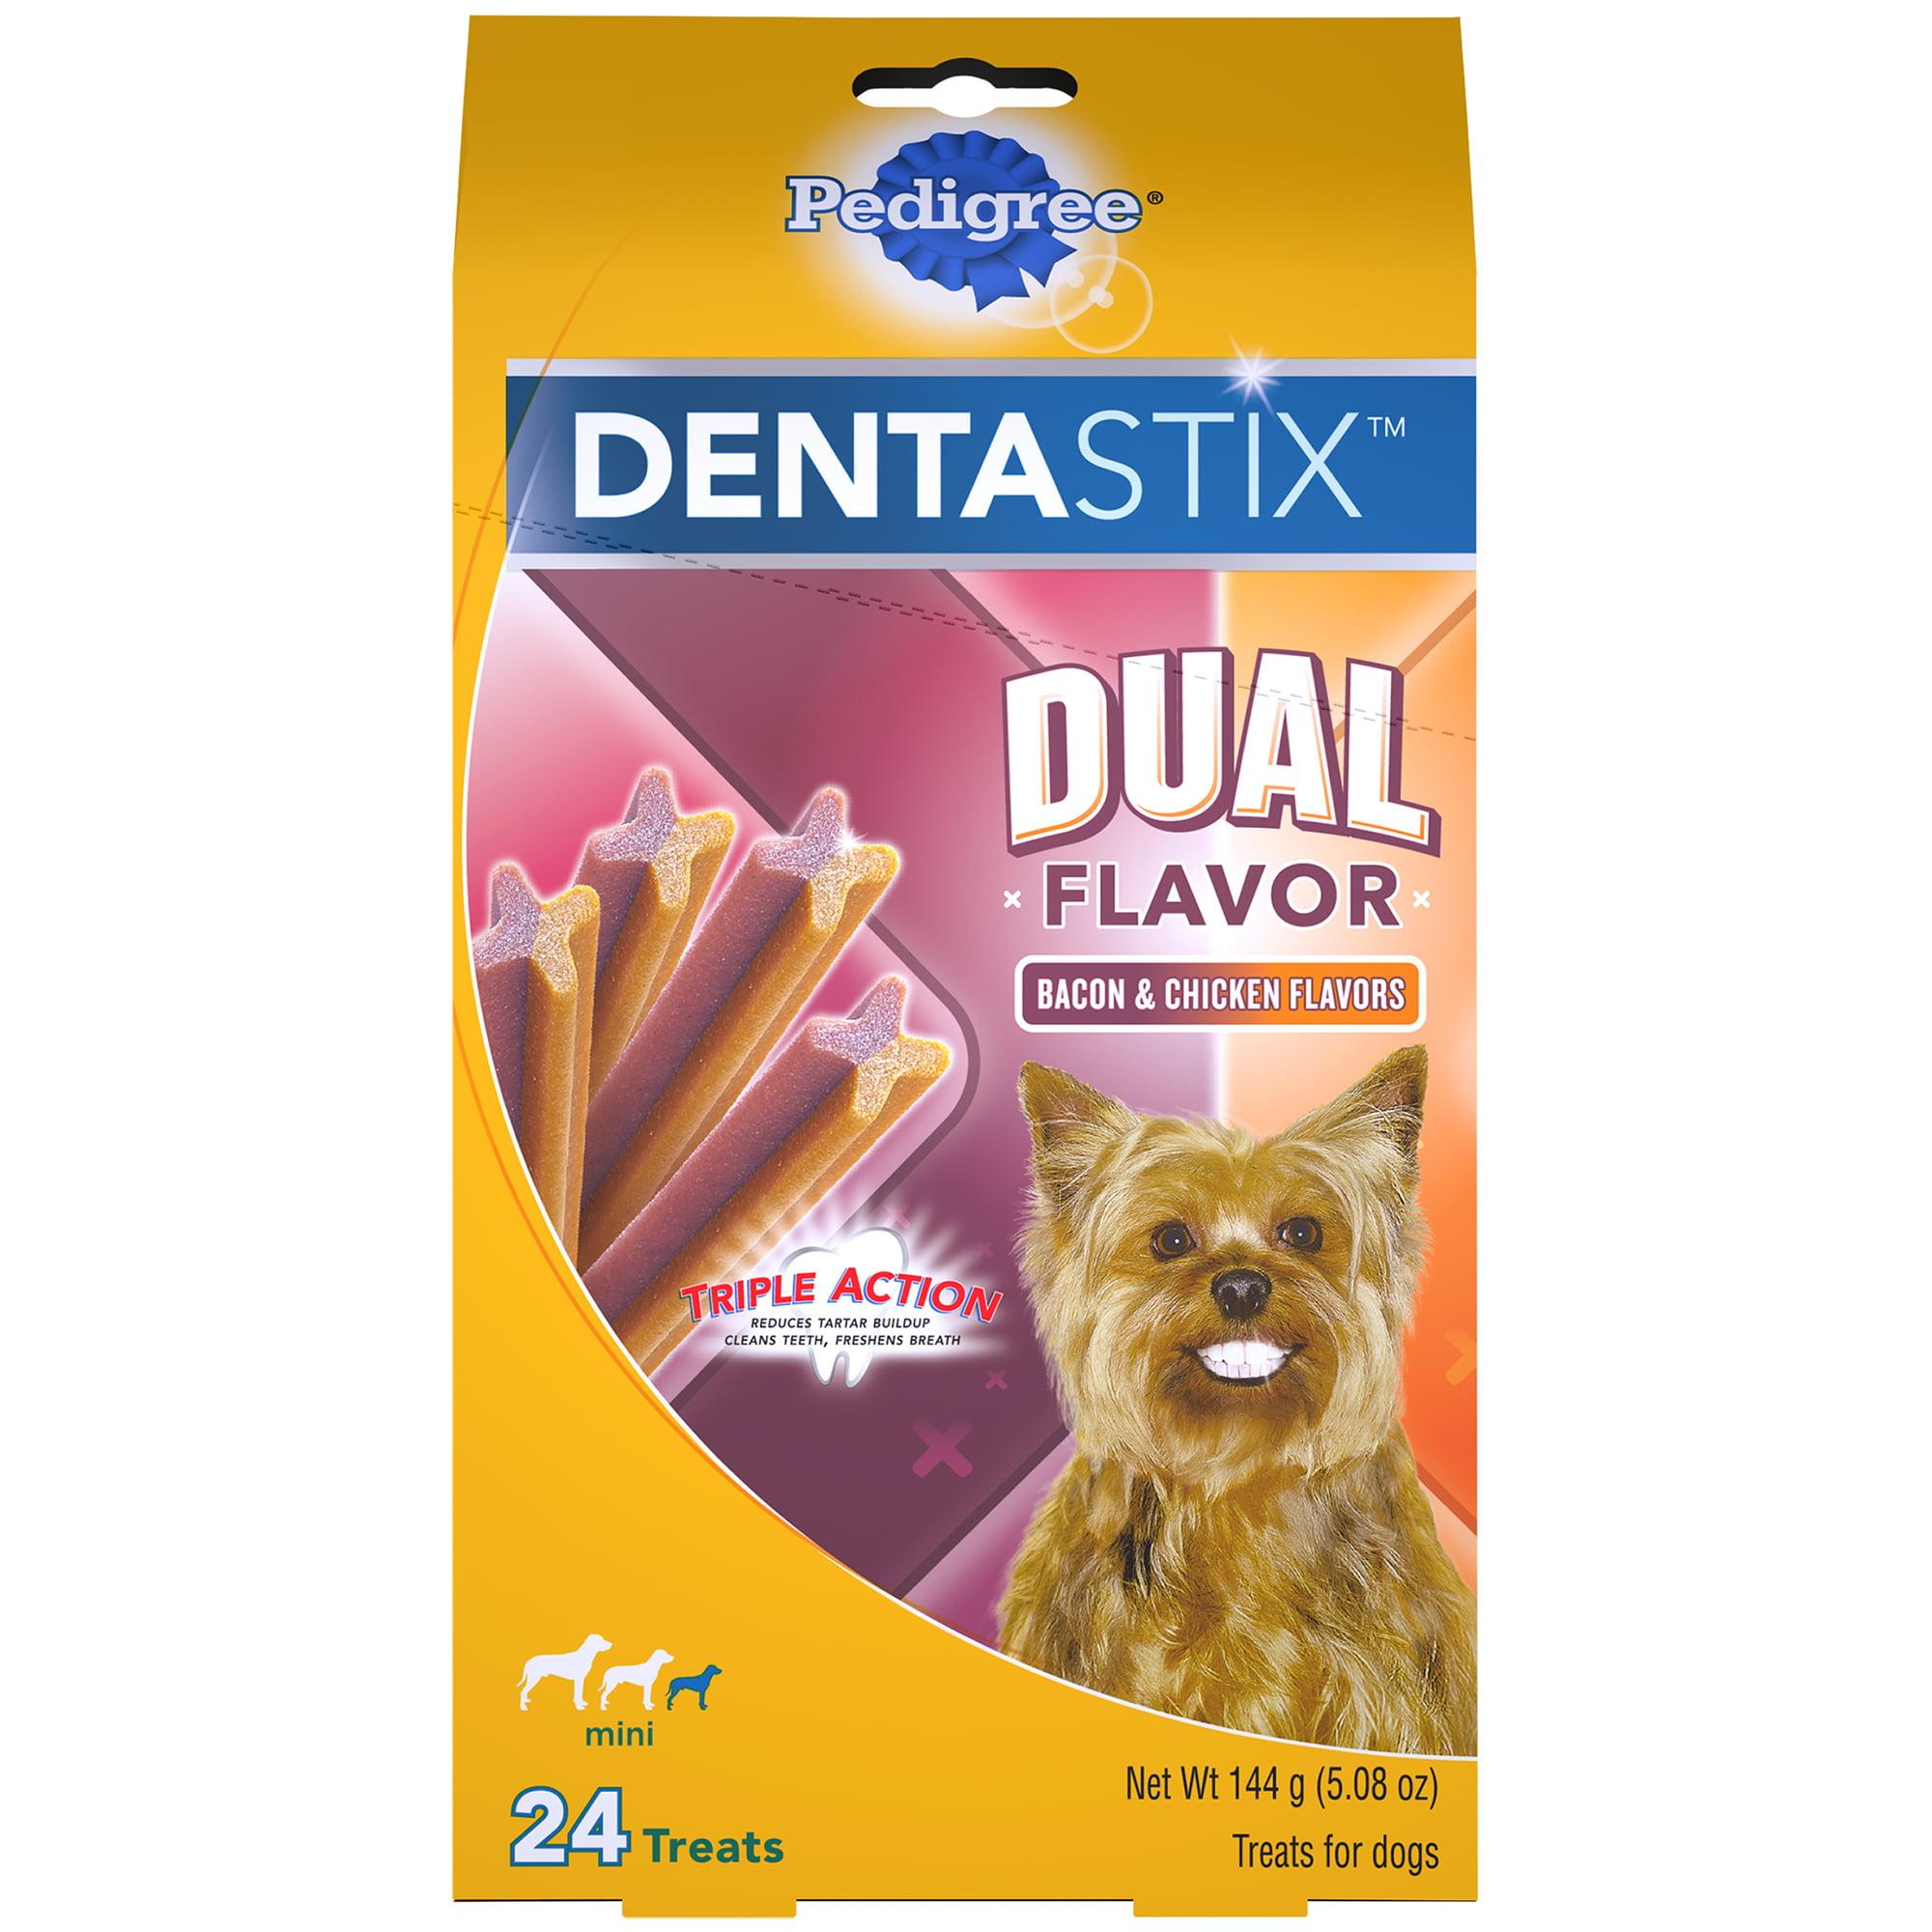 PEDIGREE DENTASTIX Dual Flavor Small Dog Treats, Bacon & Chicken Flavors, 5.08 oz. Pack (24 Treats)